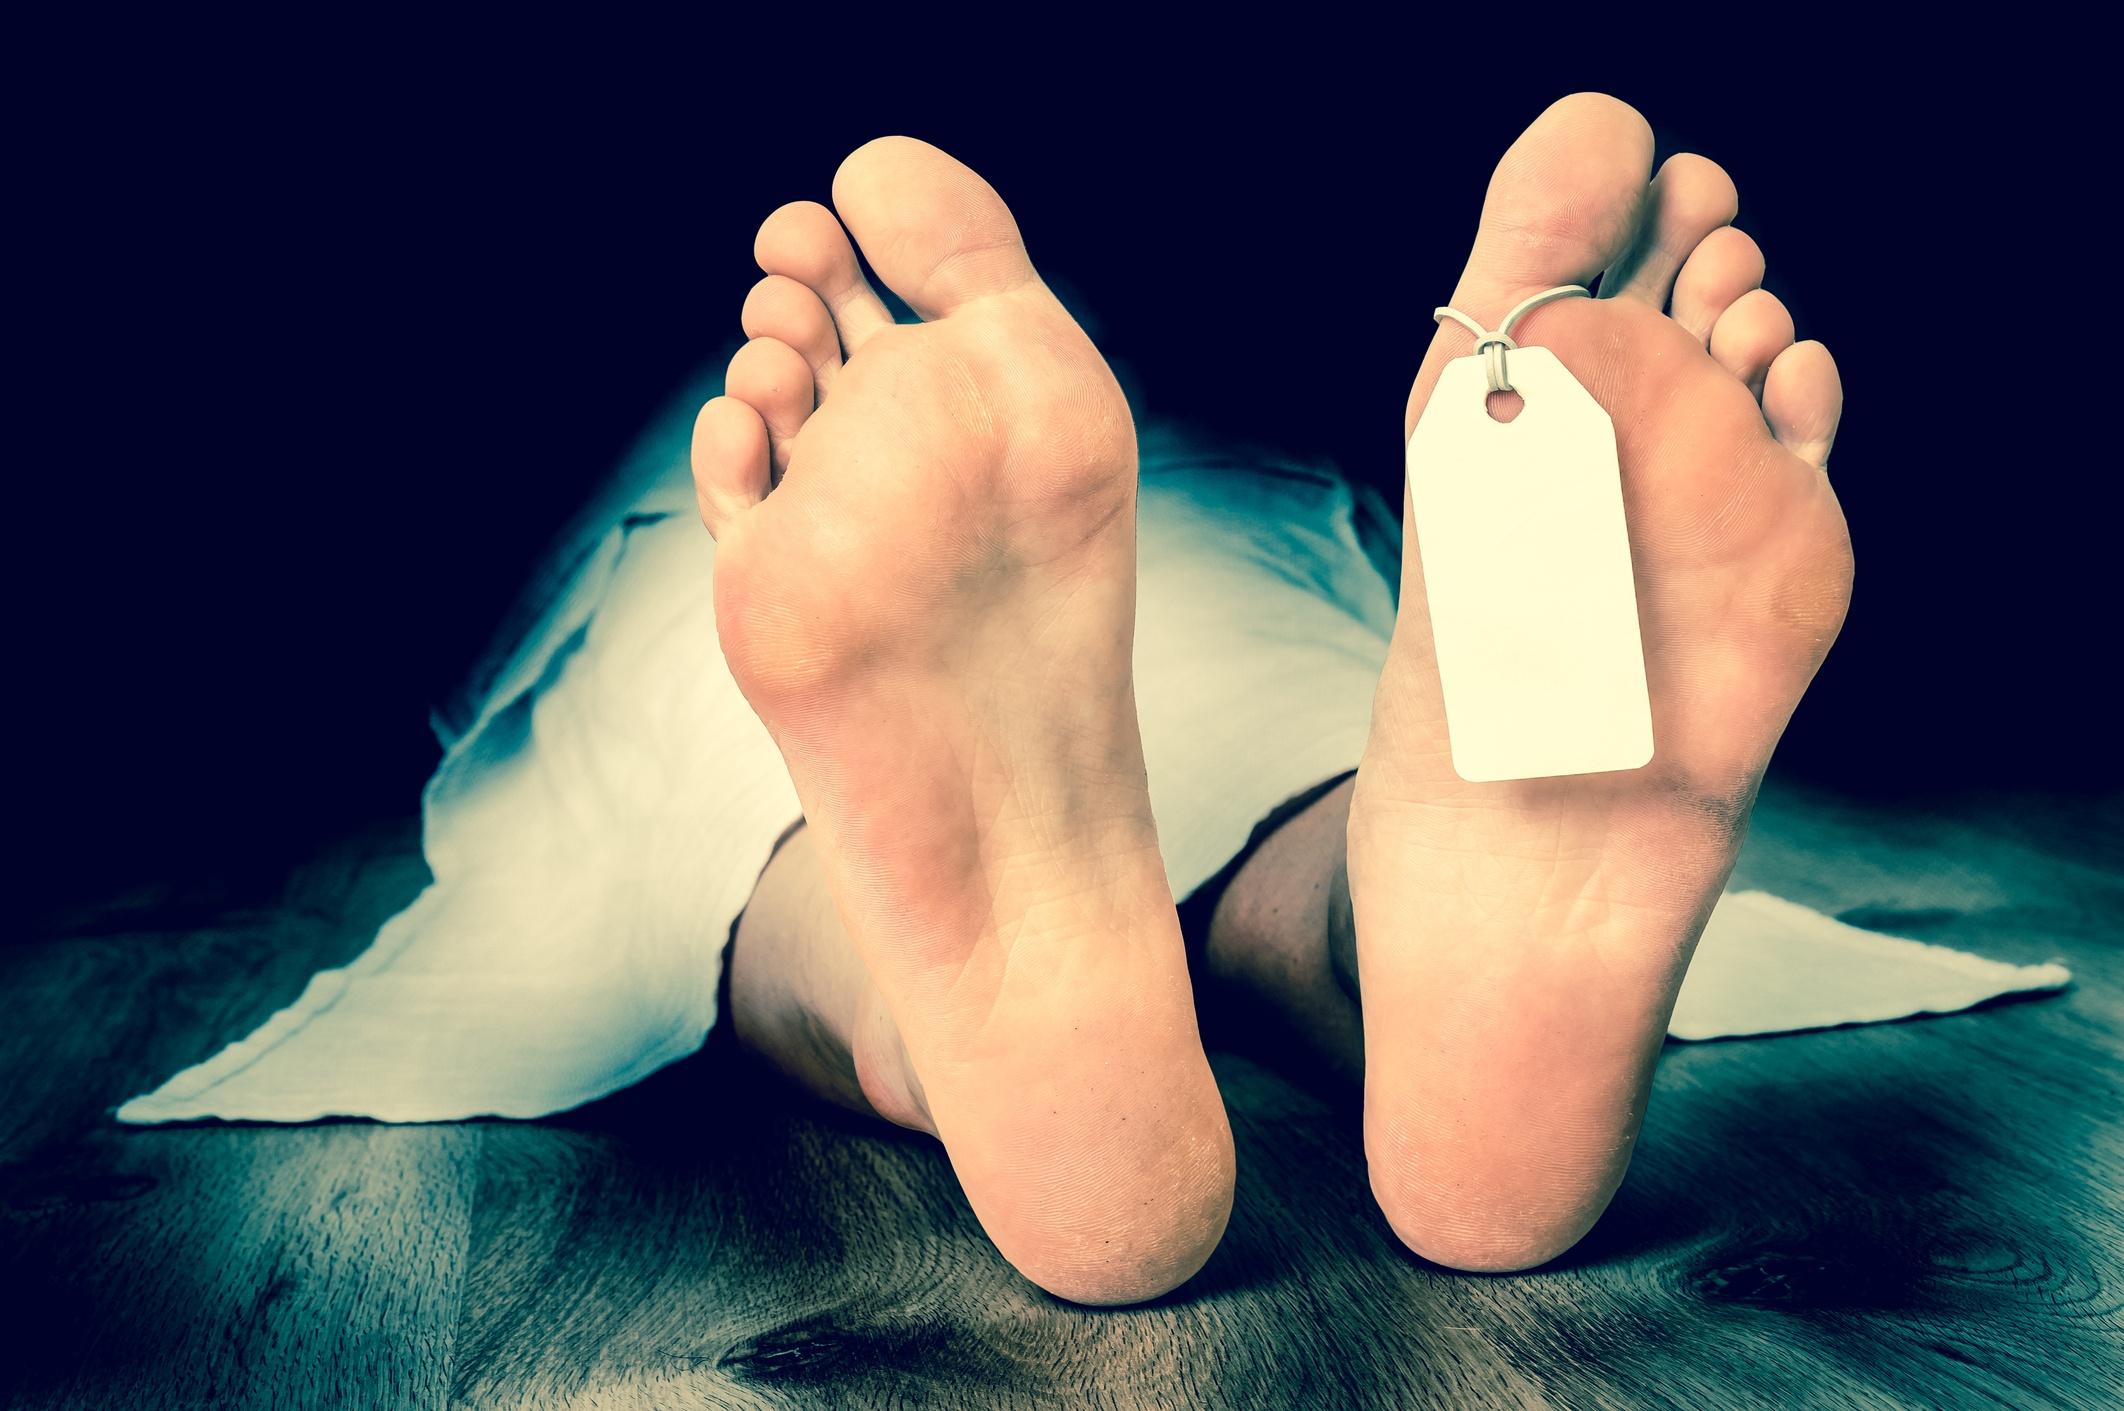 Dead body with blank tag on feet